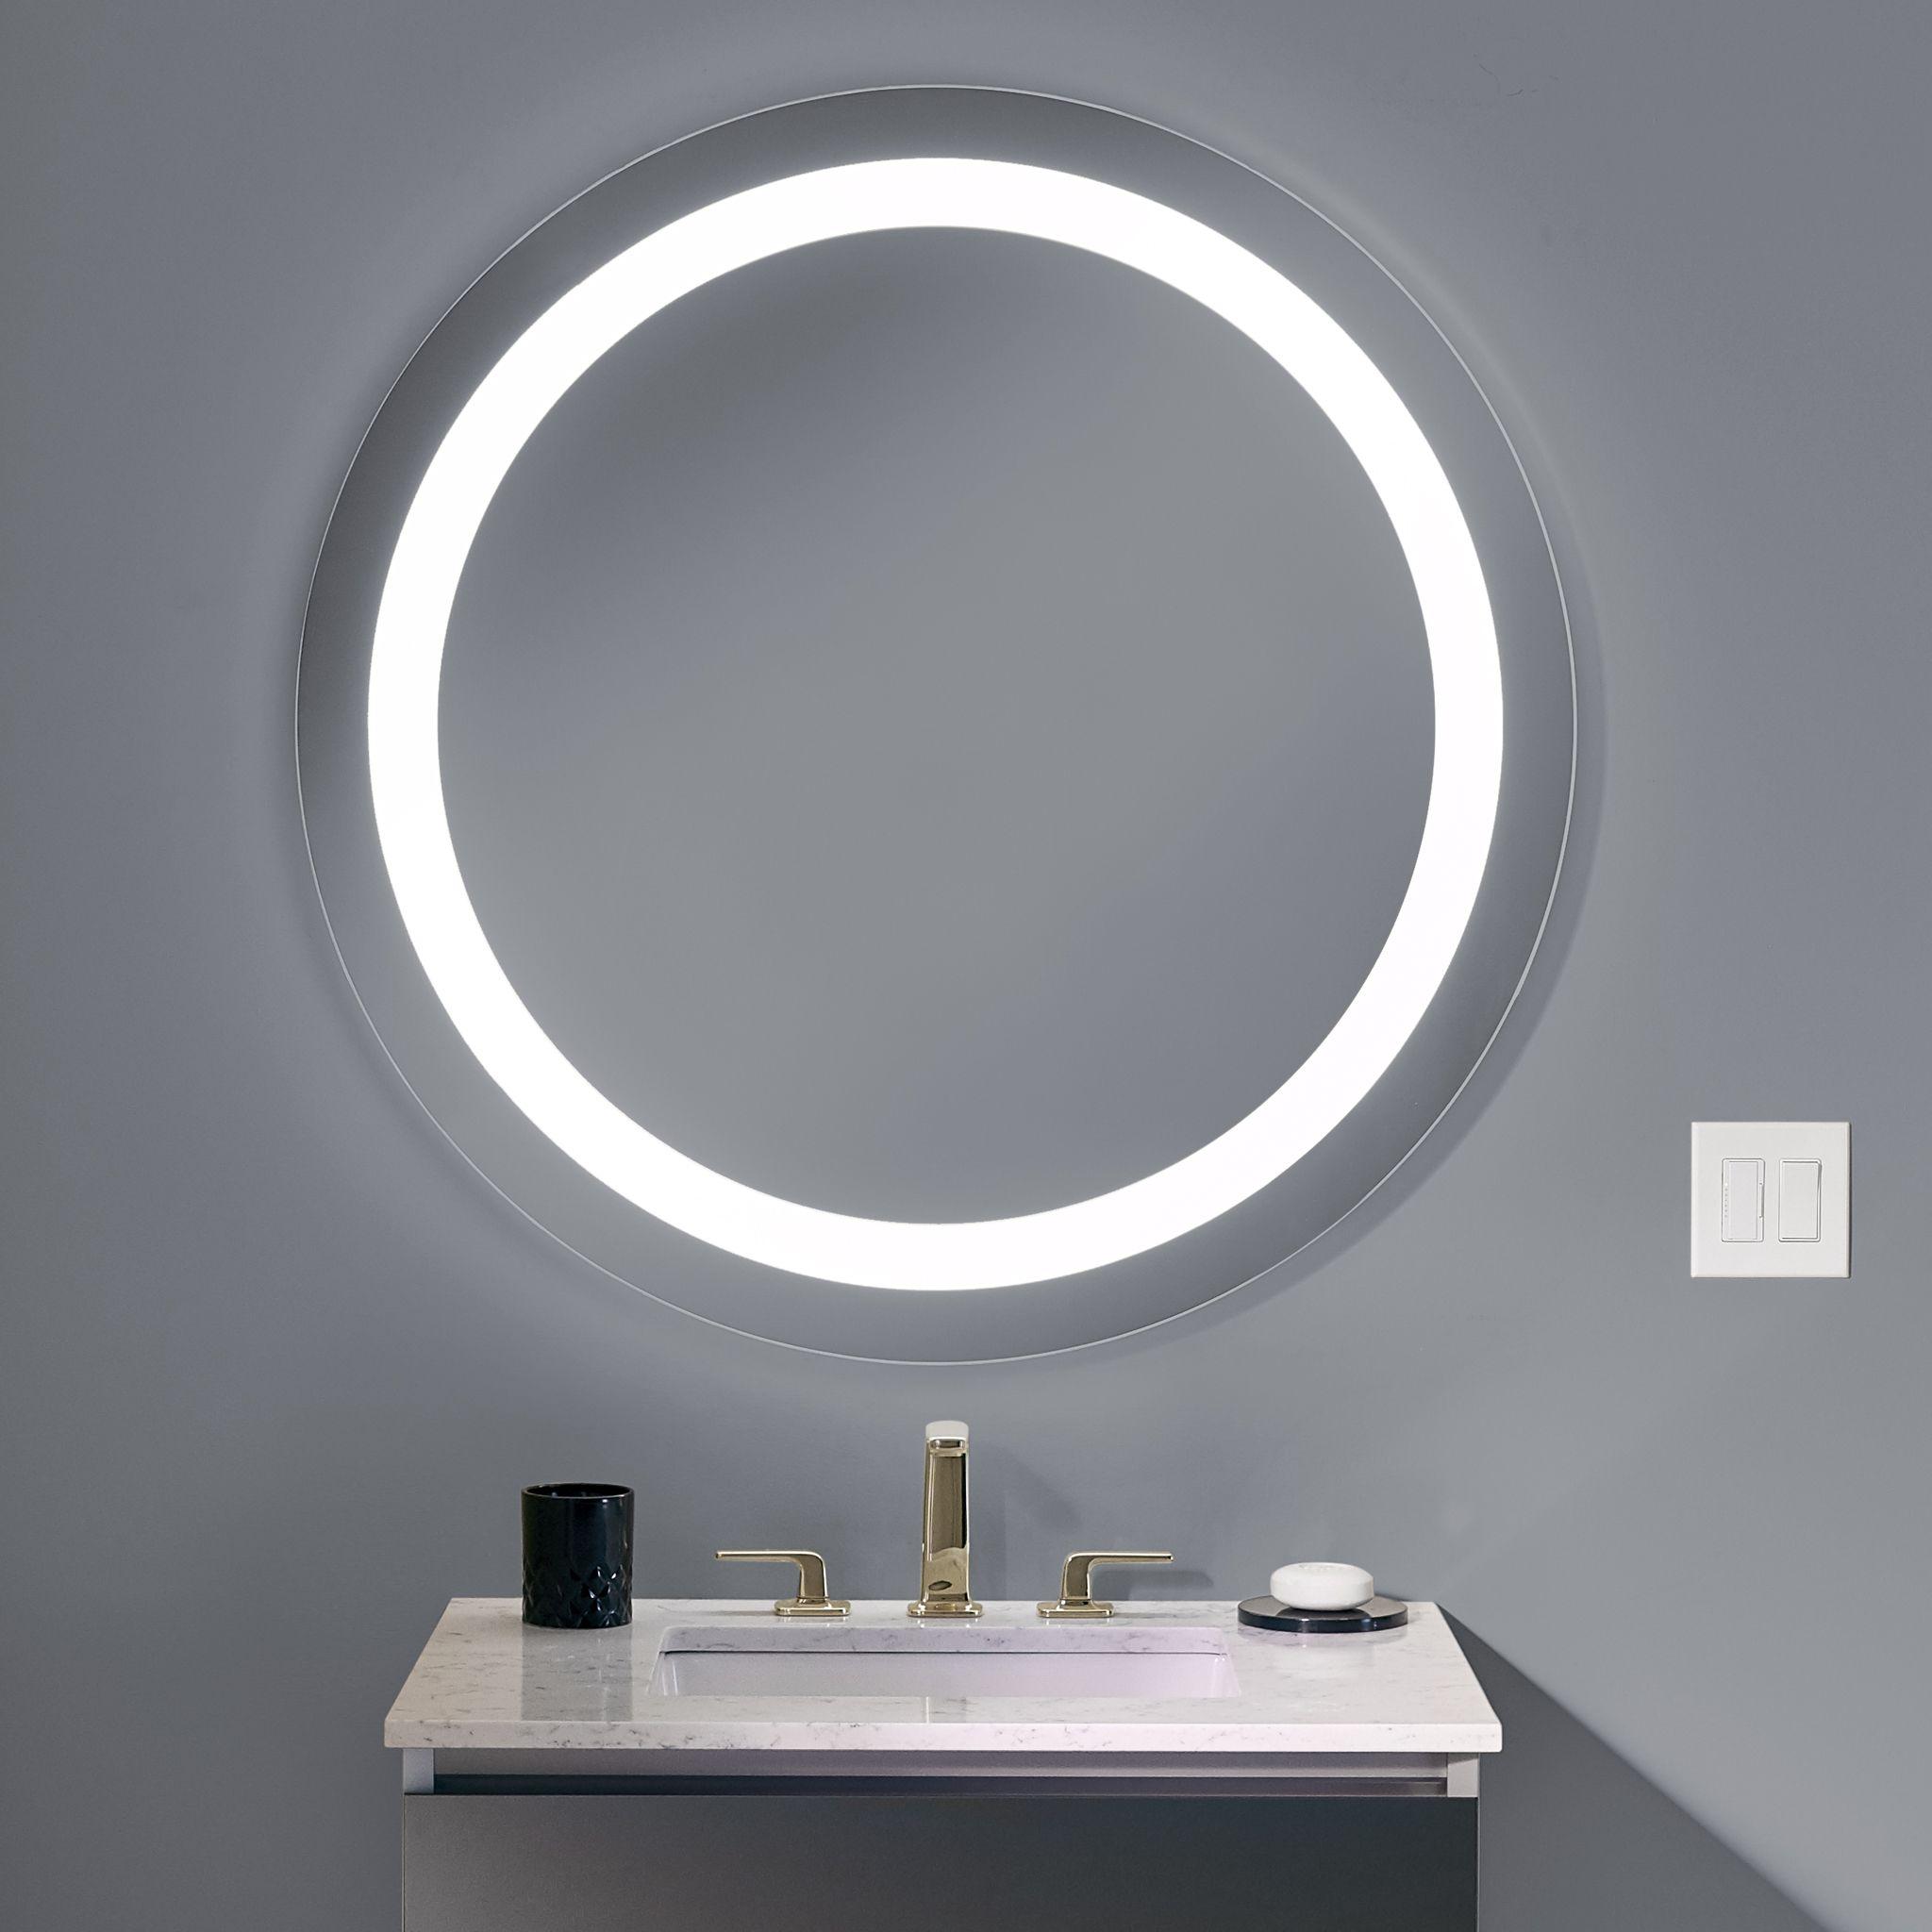 Lighted Bathroom Mirrors From Robern Kohler Co Decorative